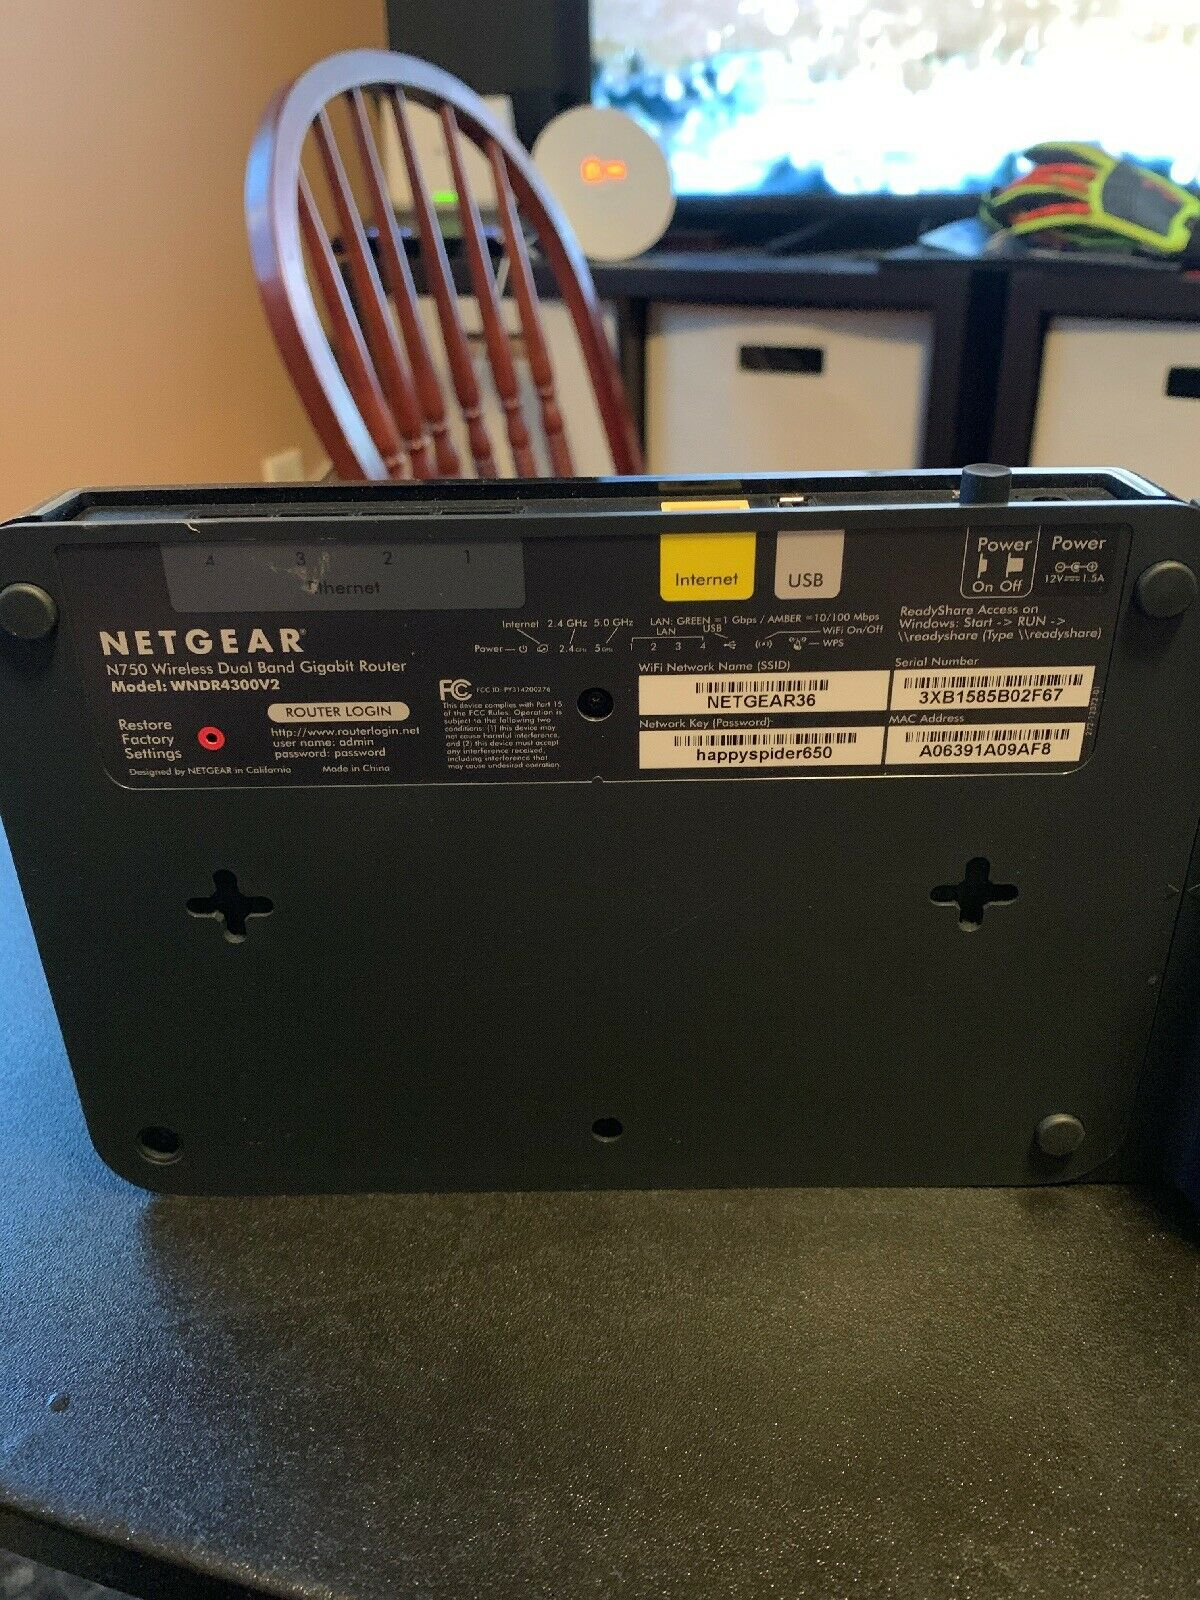 NETGEAR N750 WiFi Wireless Dual Band Gigabit Router WNDR4300V2